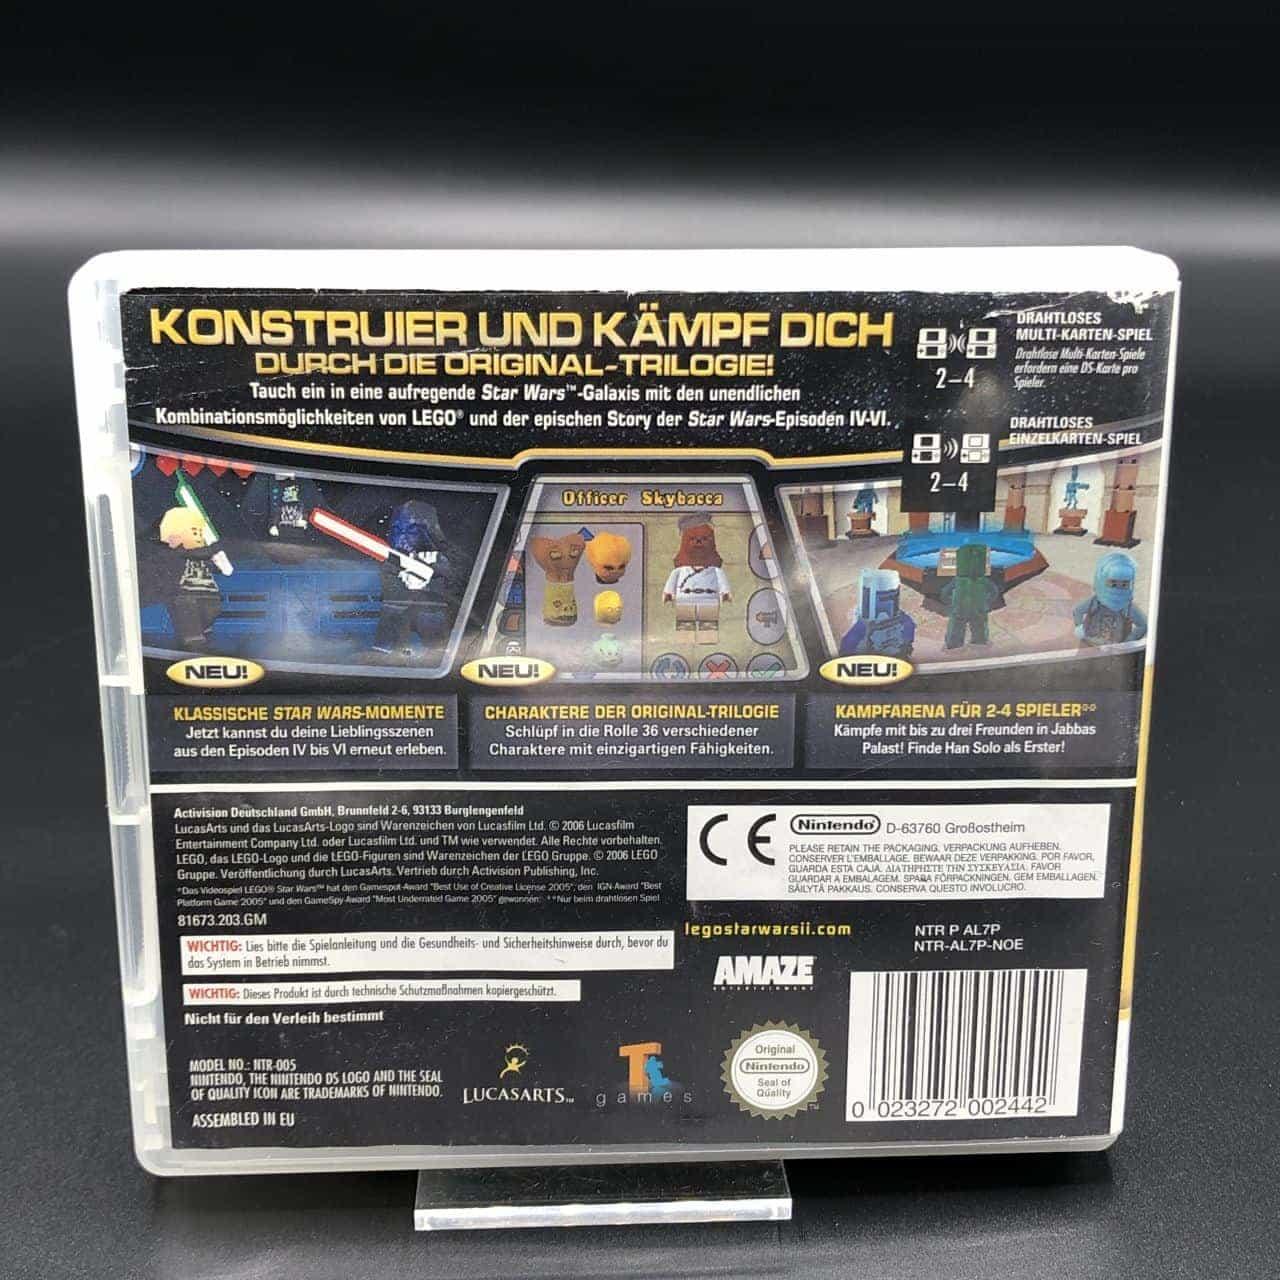 Lego Star Wars II: Die Klassische Trilogie (Komplett) (Gebrauchsspuren) Nintendo DS